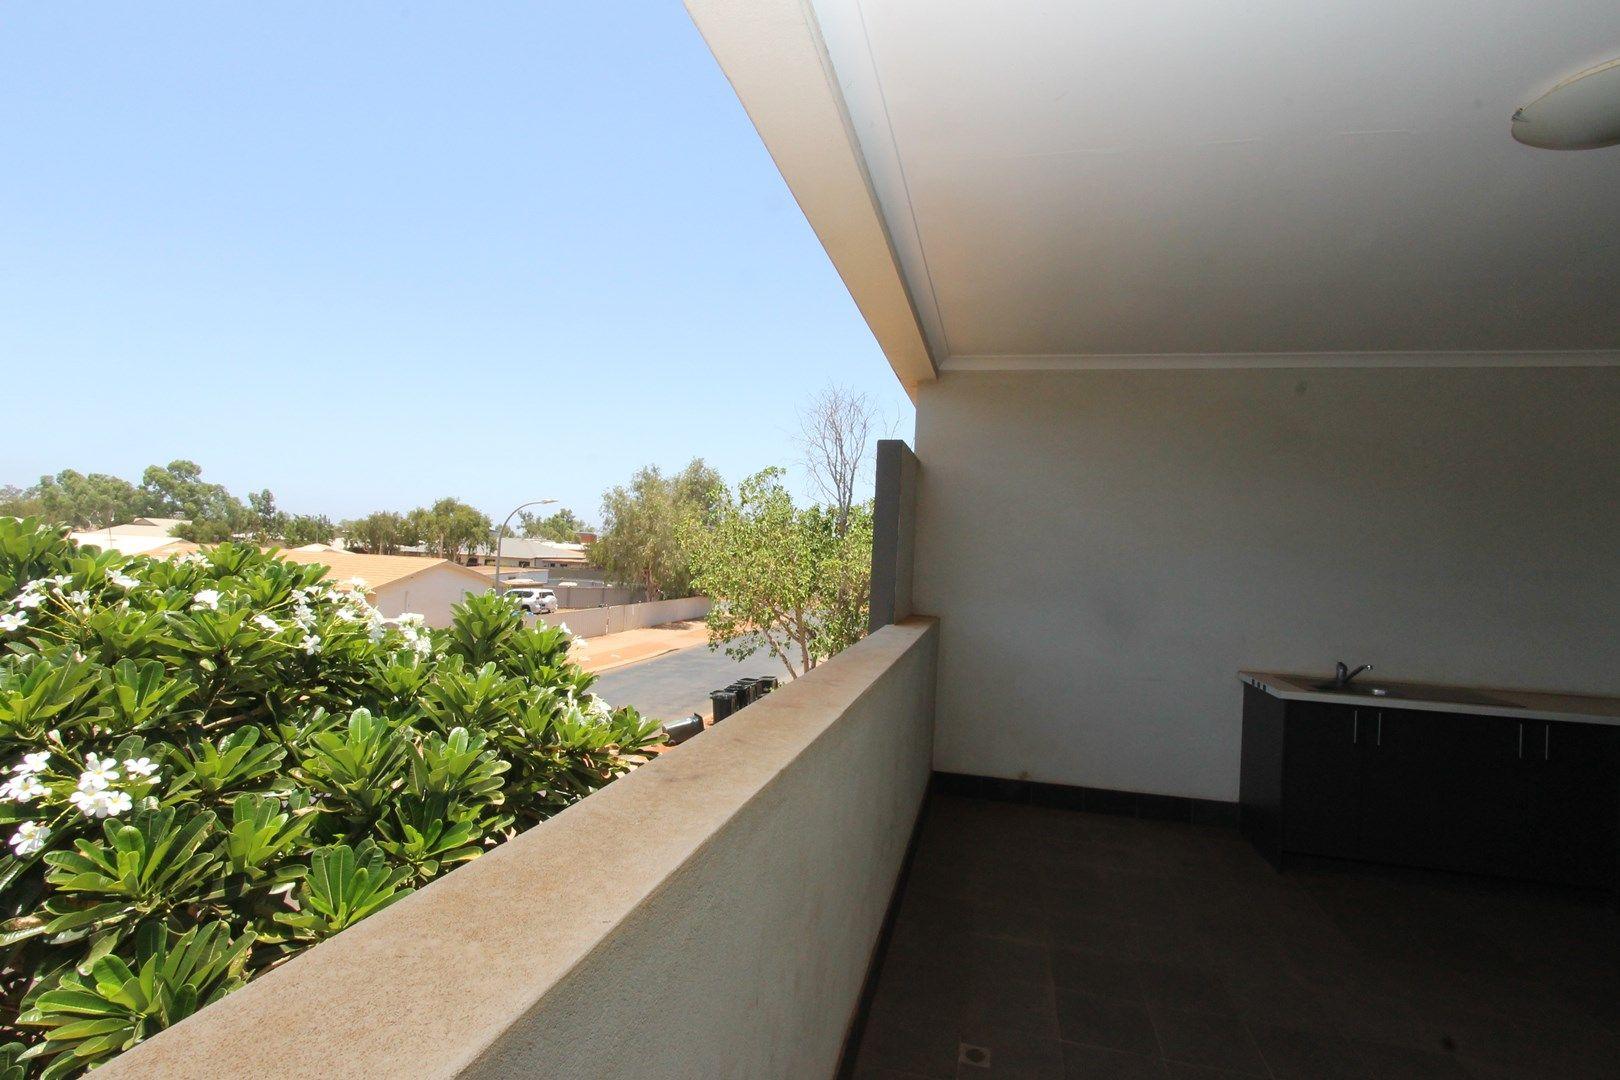 17/1 Lawson Street, South Hedland WA 6722, Image 0